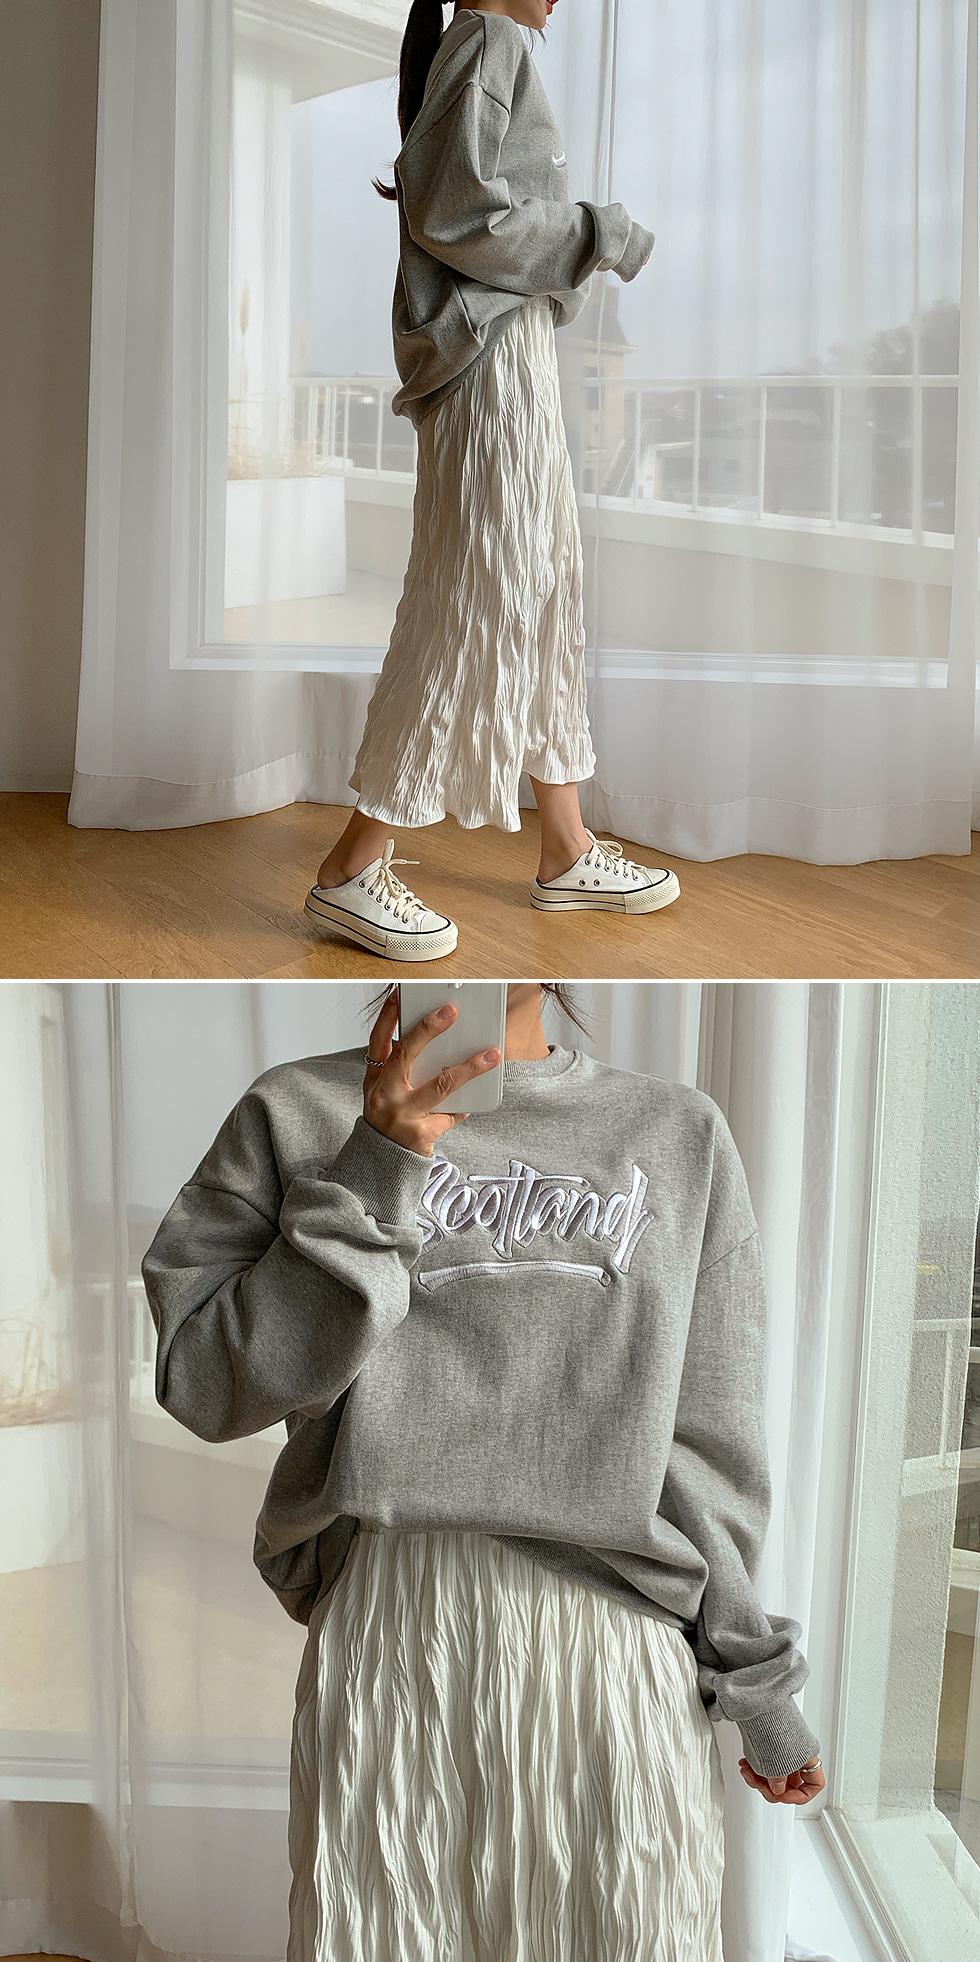 Scott embroidery Sweatshirt